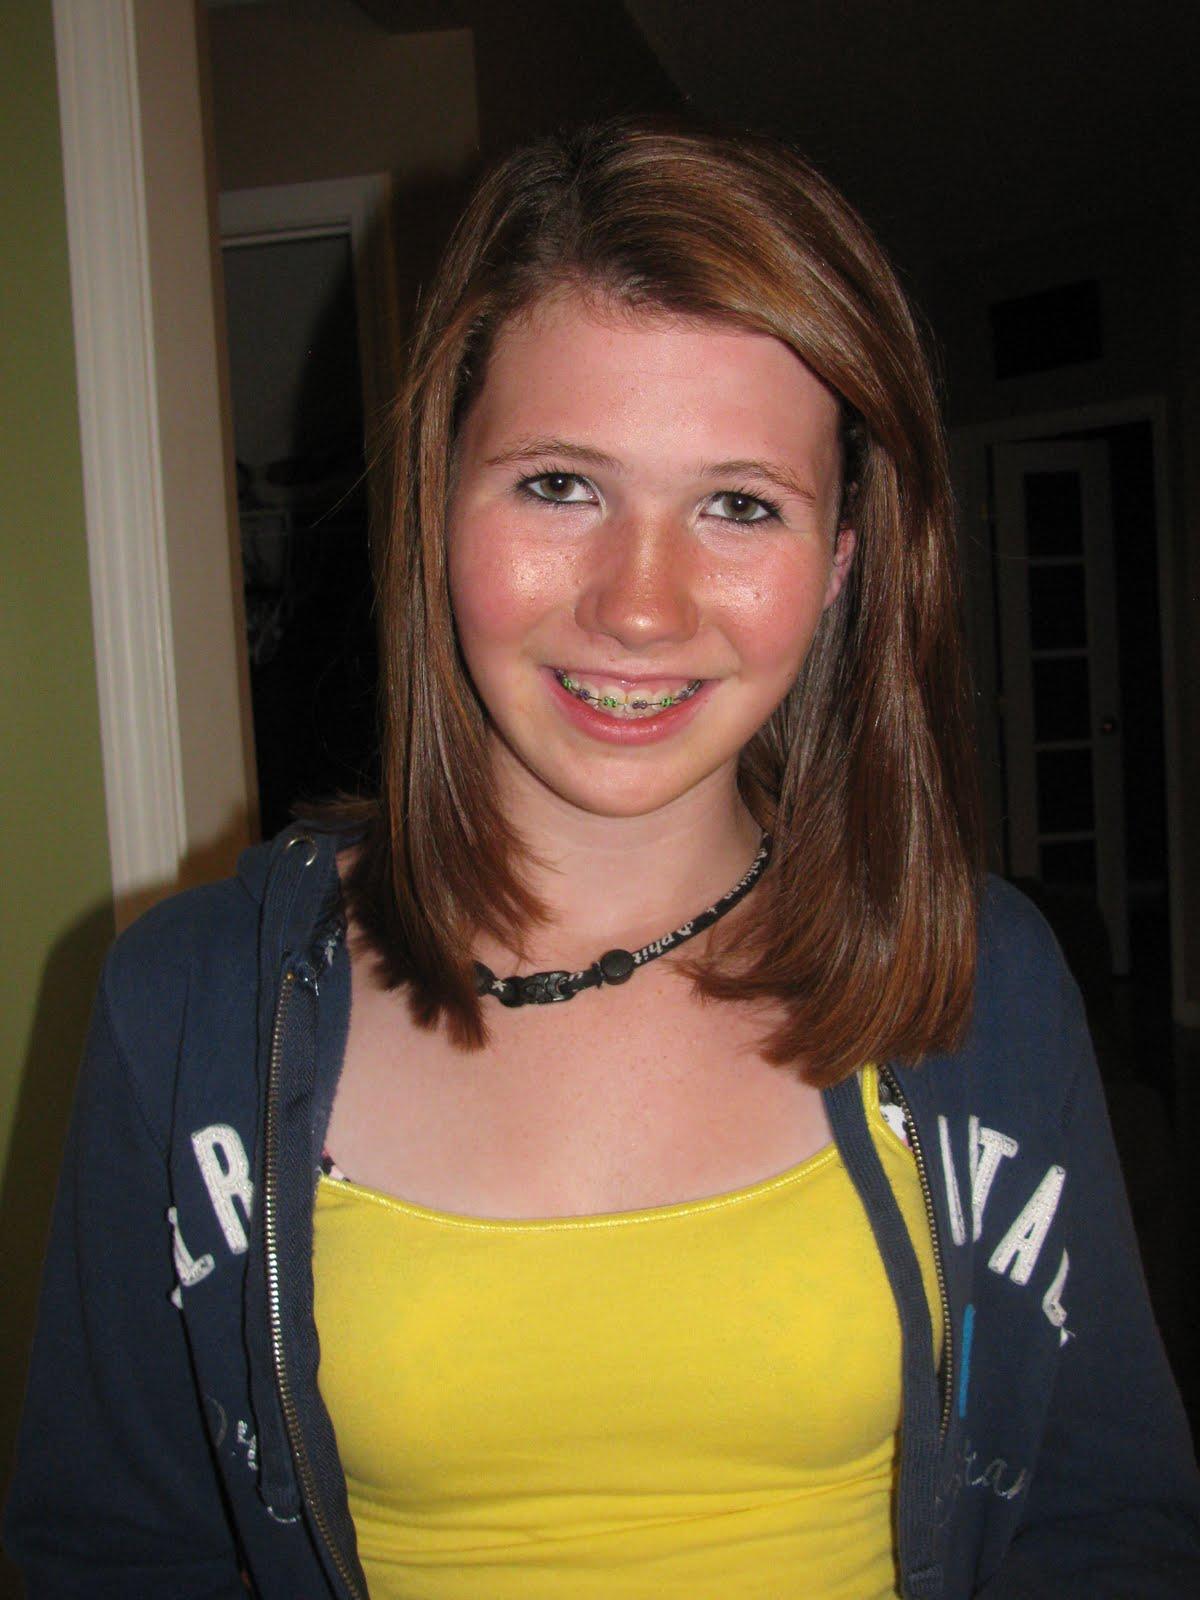 Sweet Kayley 1